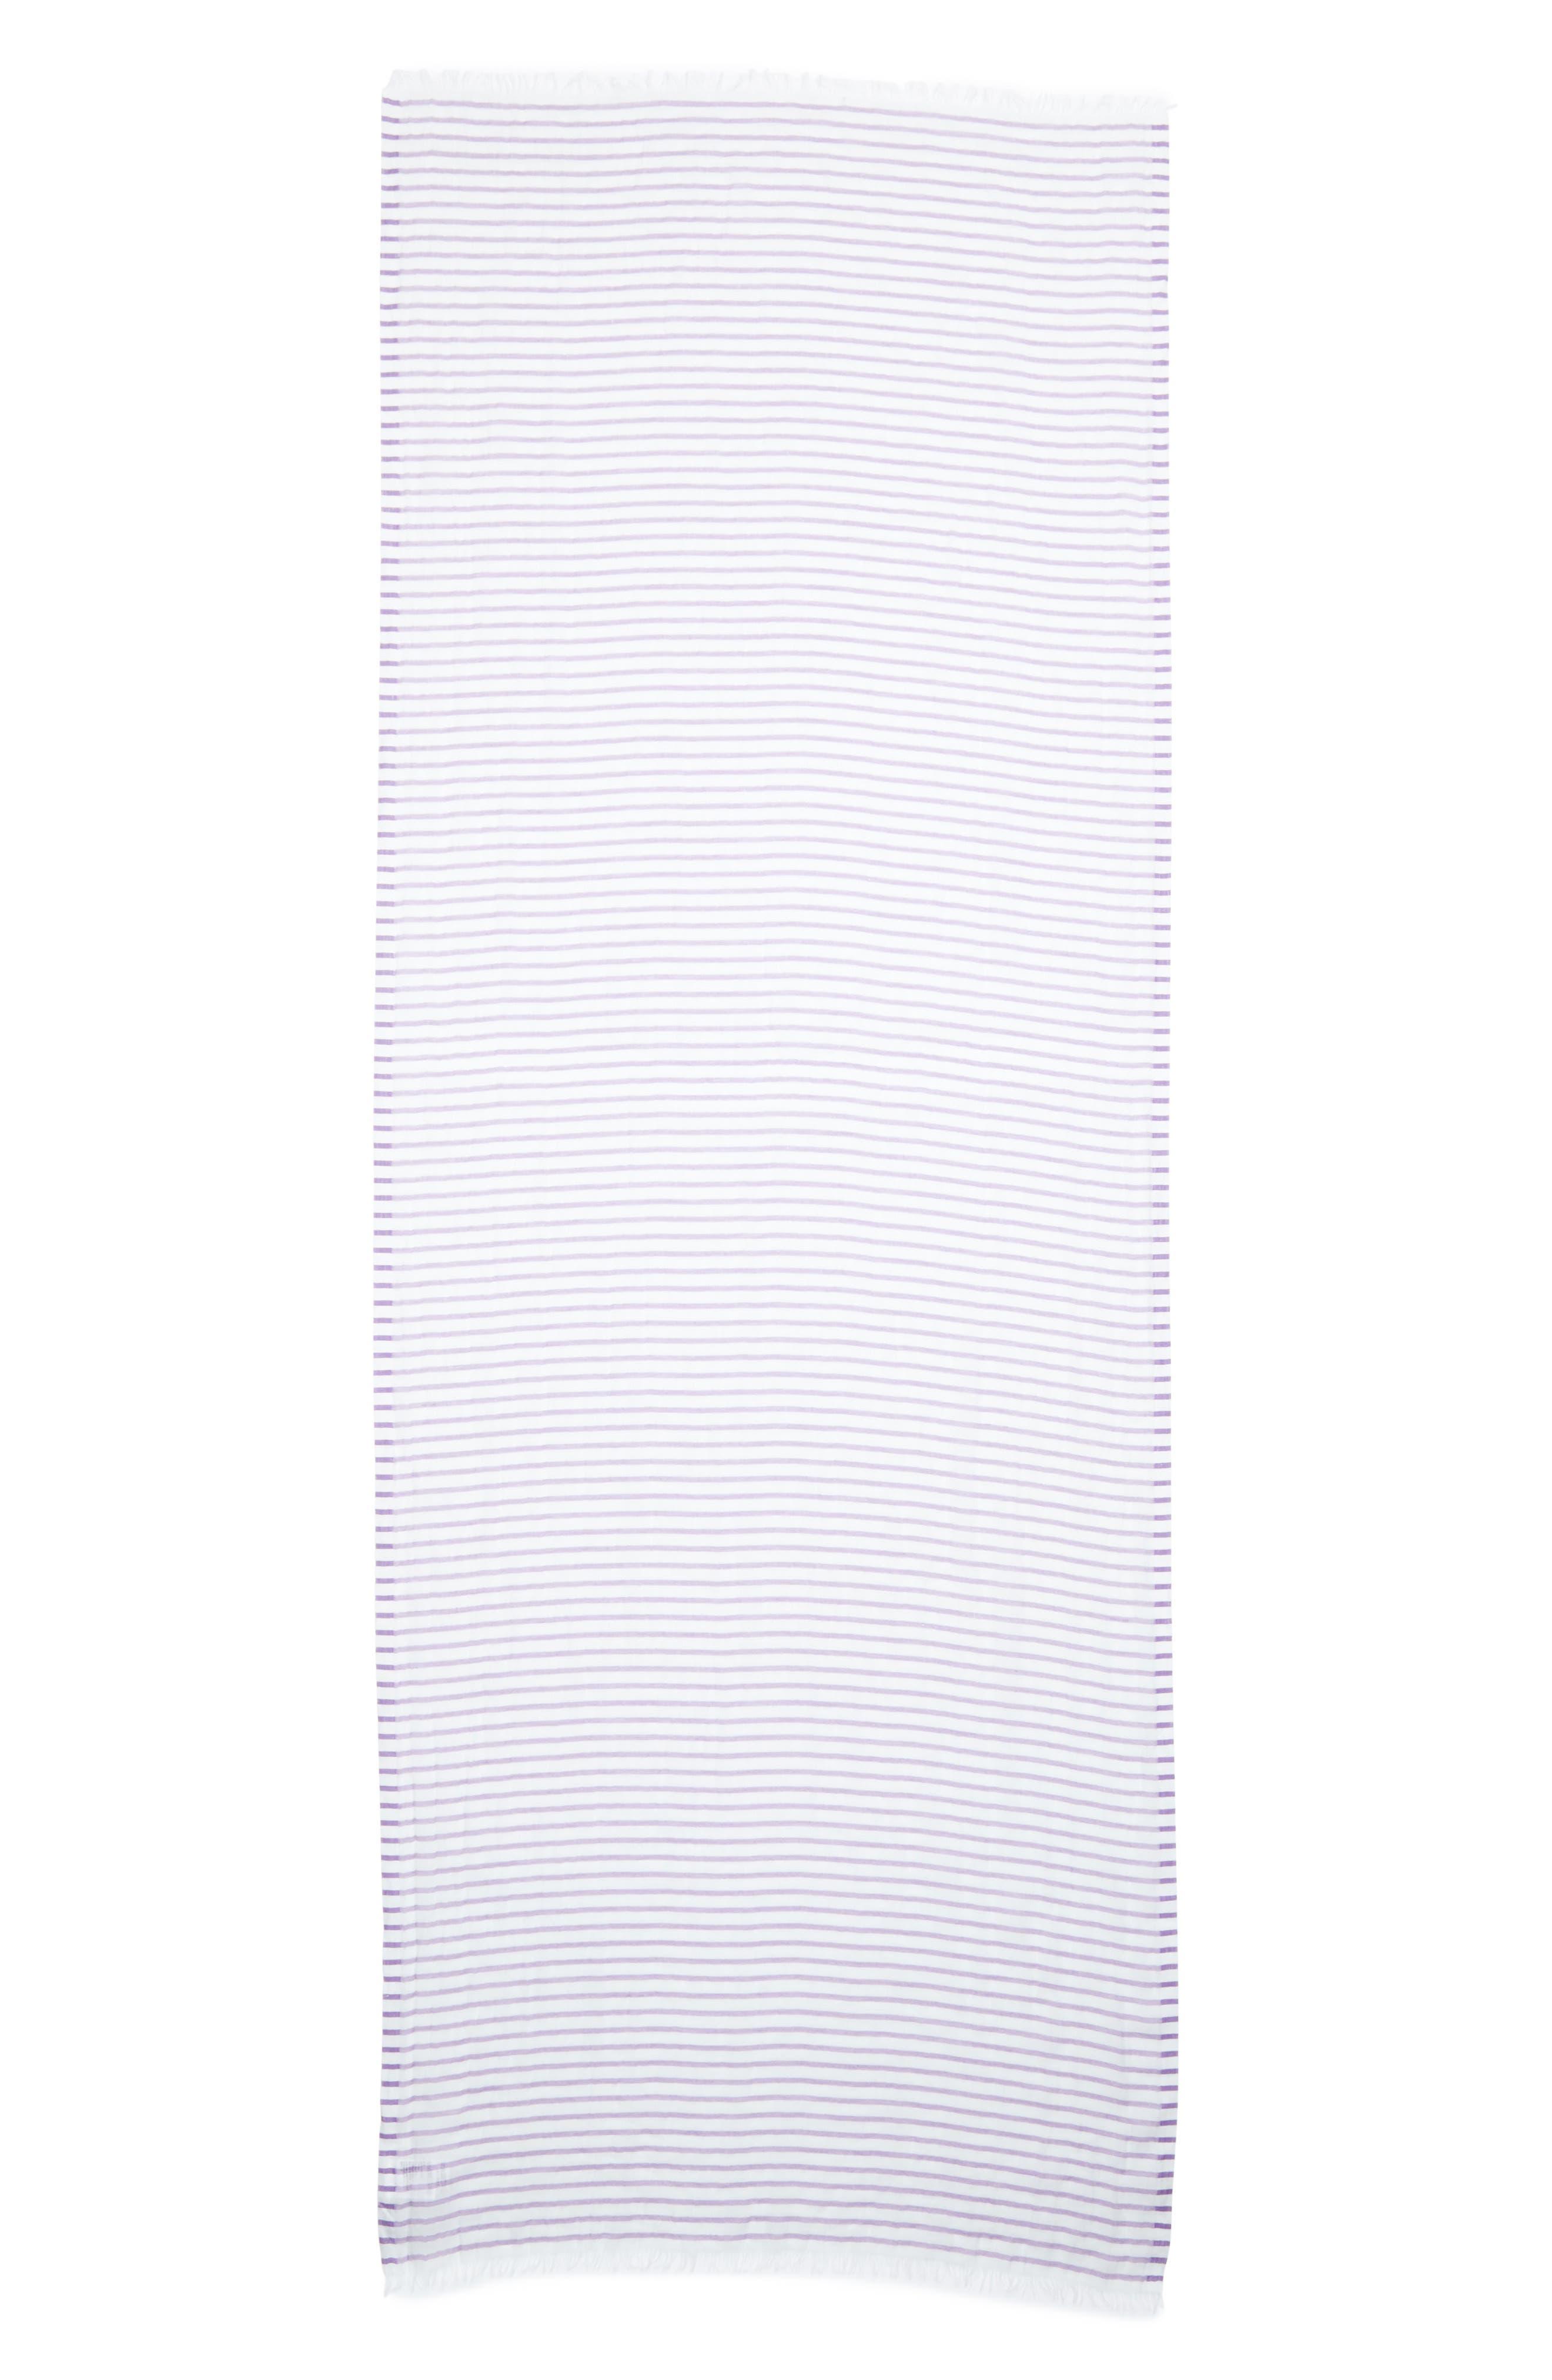 Max Mara Reed Stripe Cotton & Linen Scarf